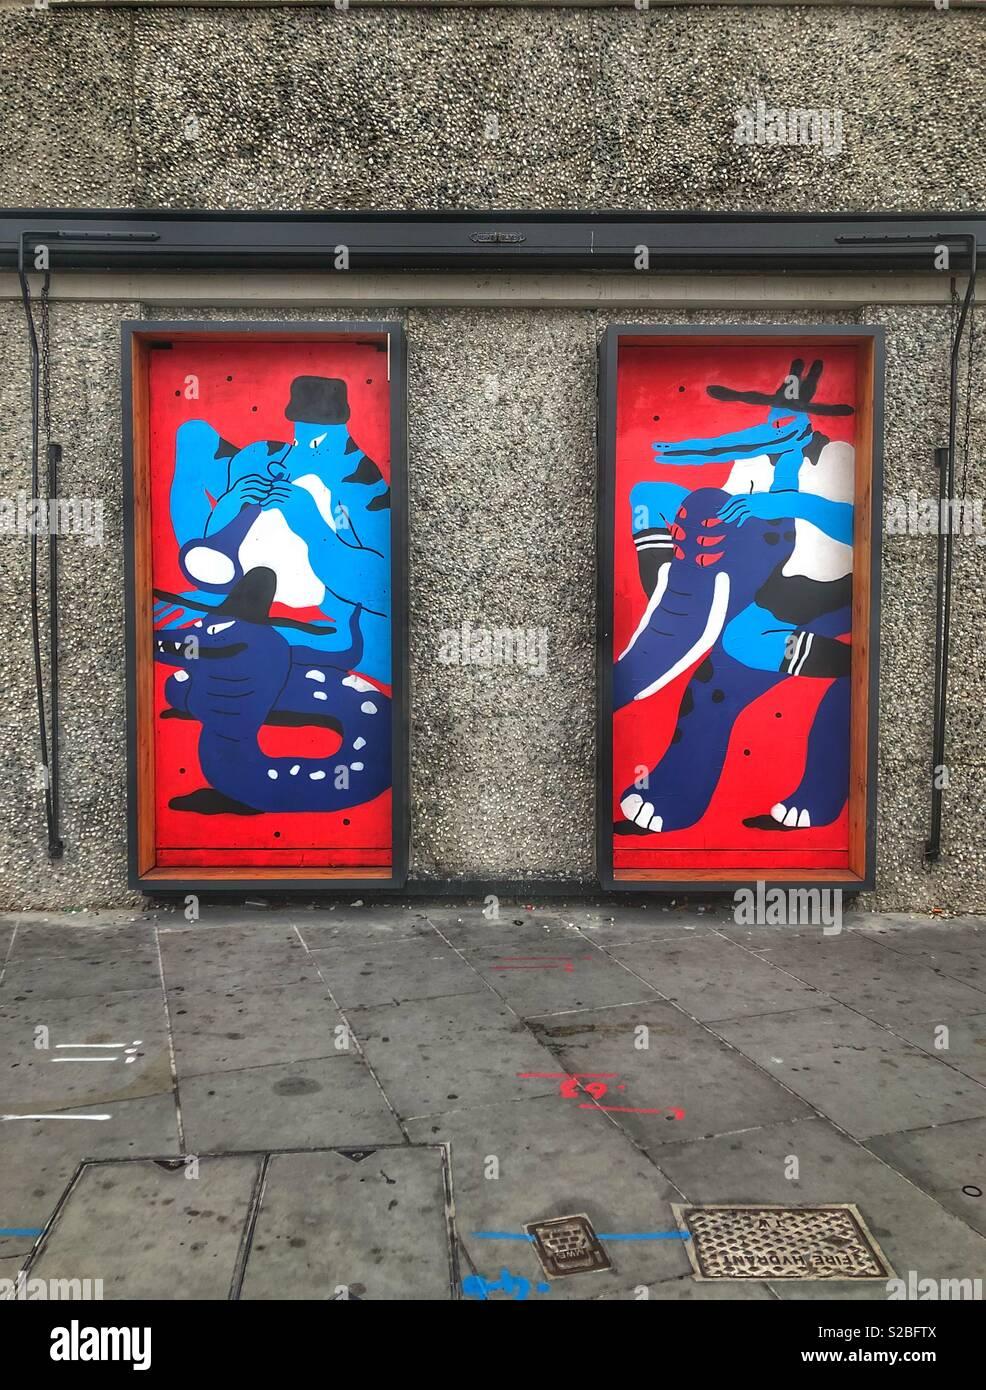 Shoreditch street art - no filter - Stock Image